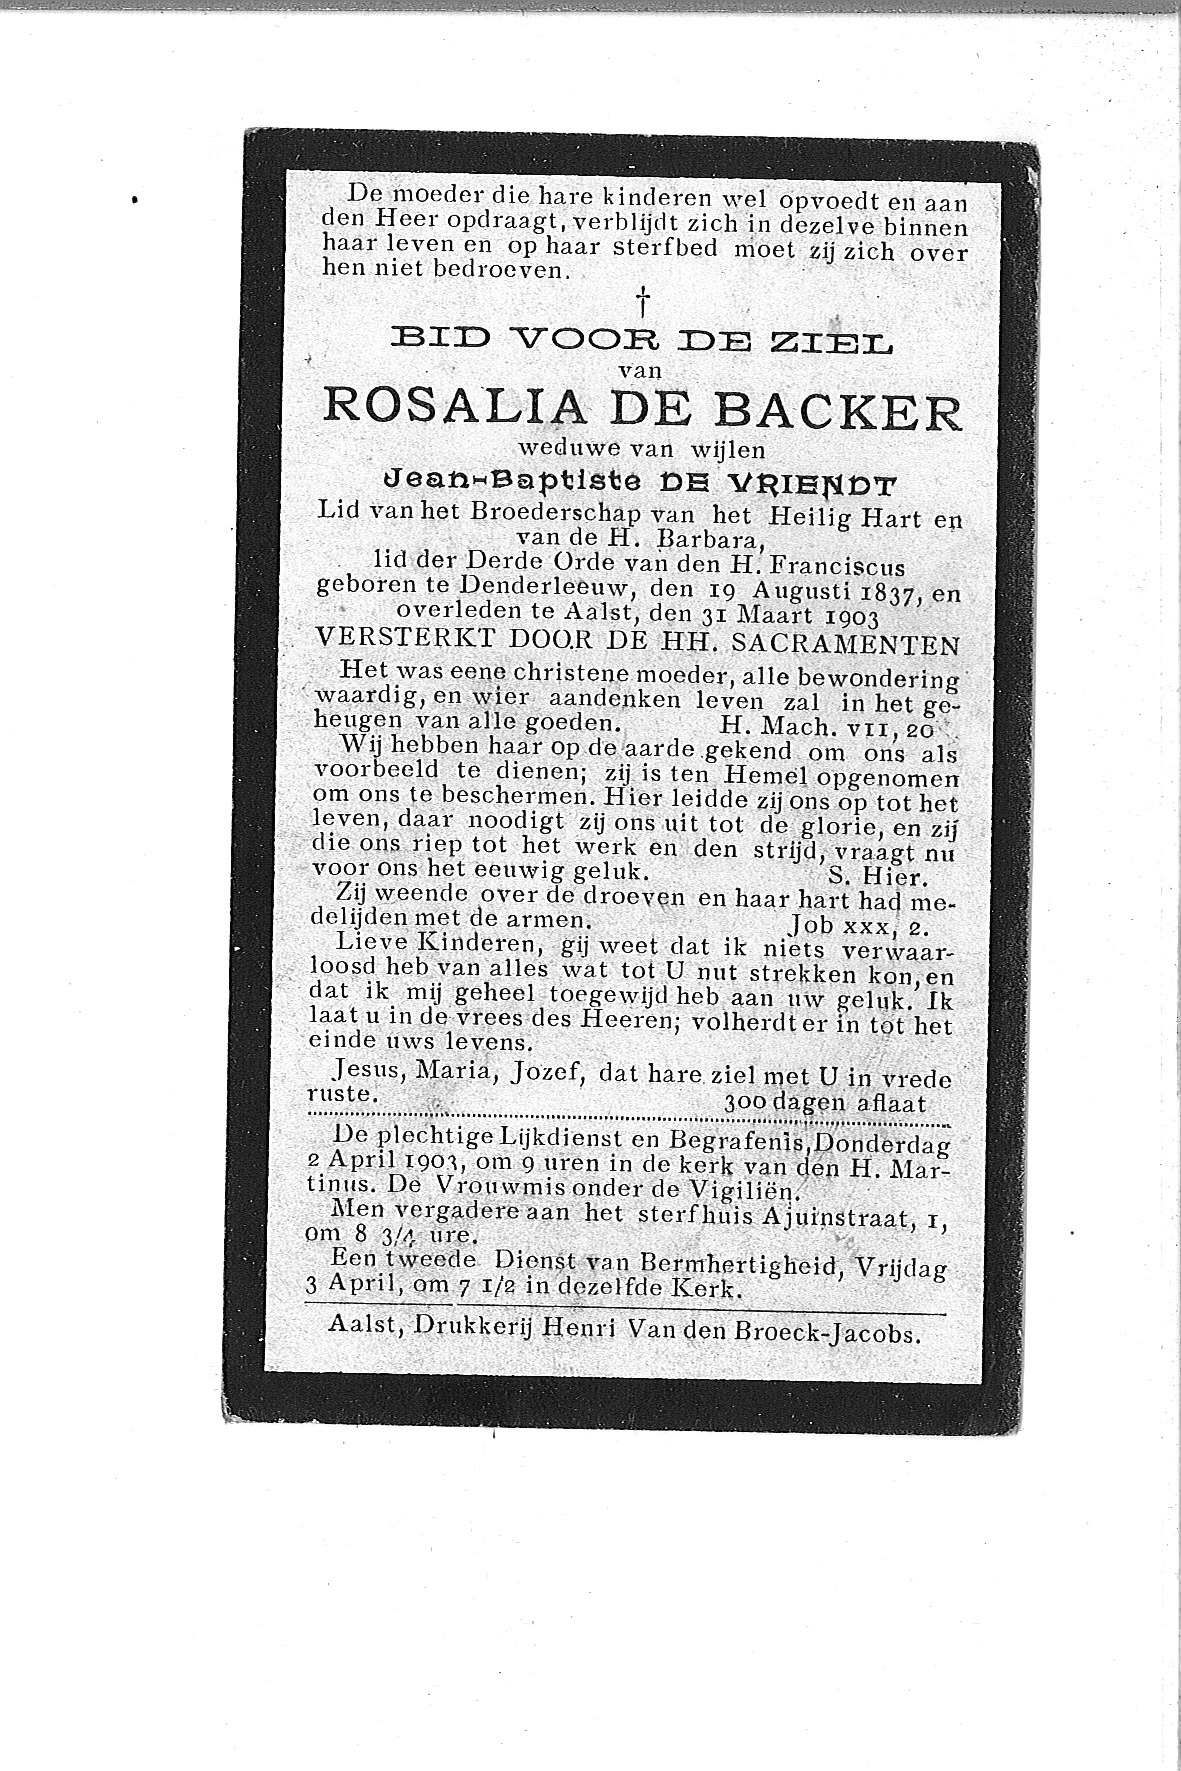 Rosalia (1903) 20120529153758_00050.jpg